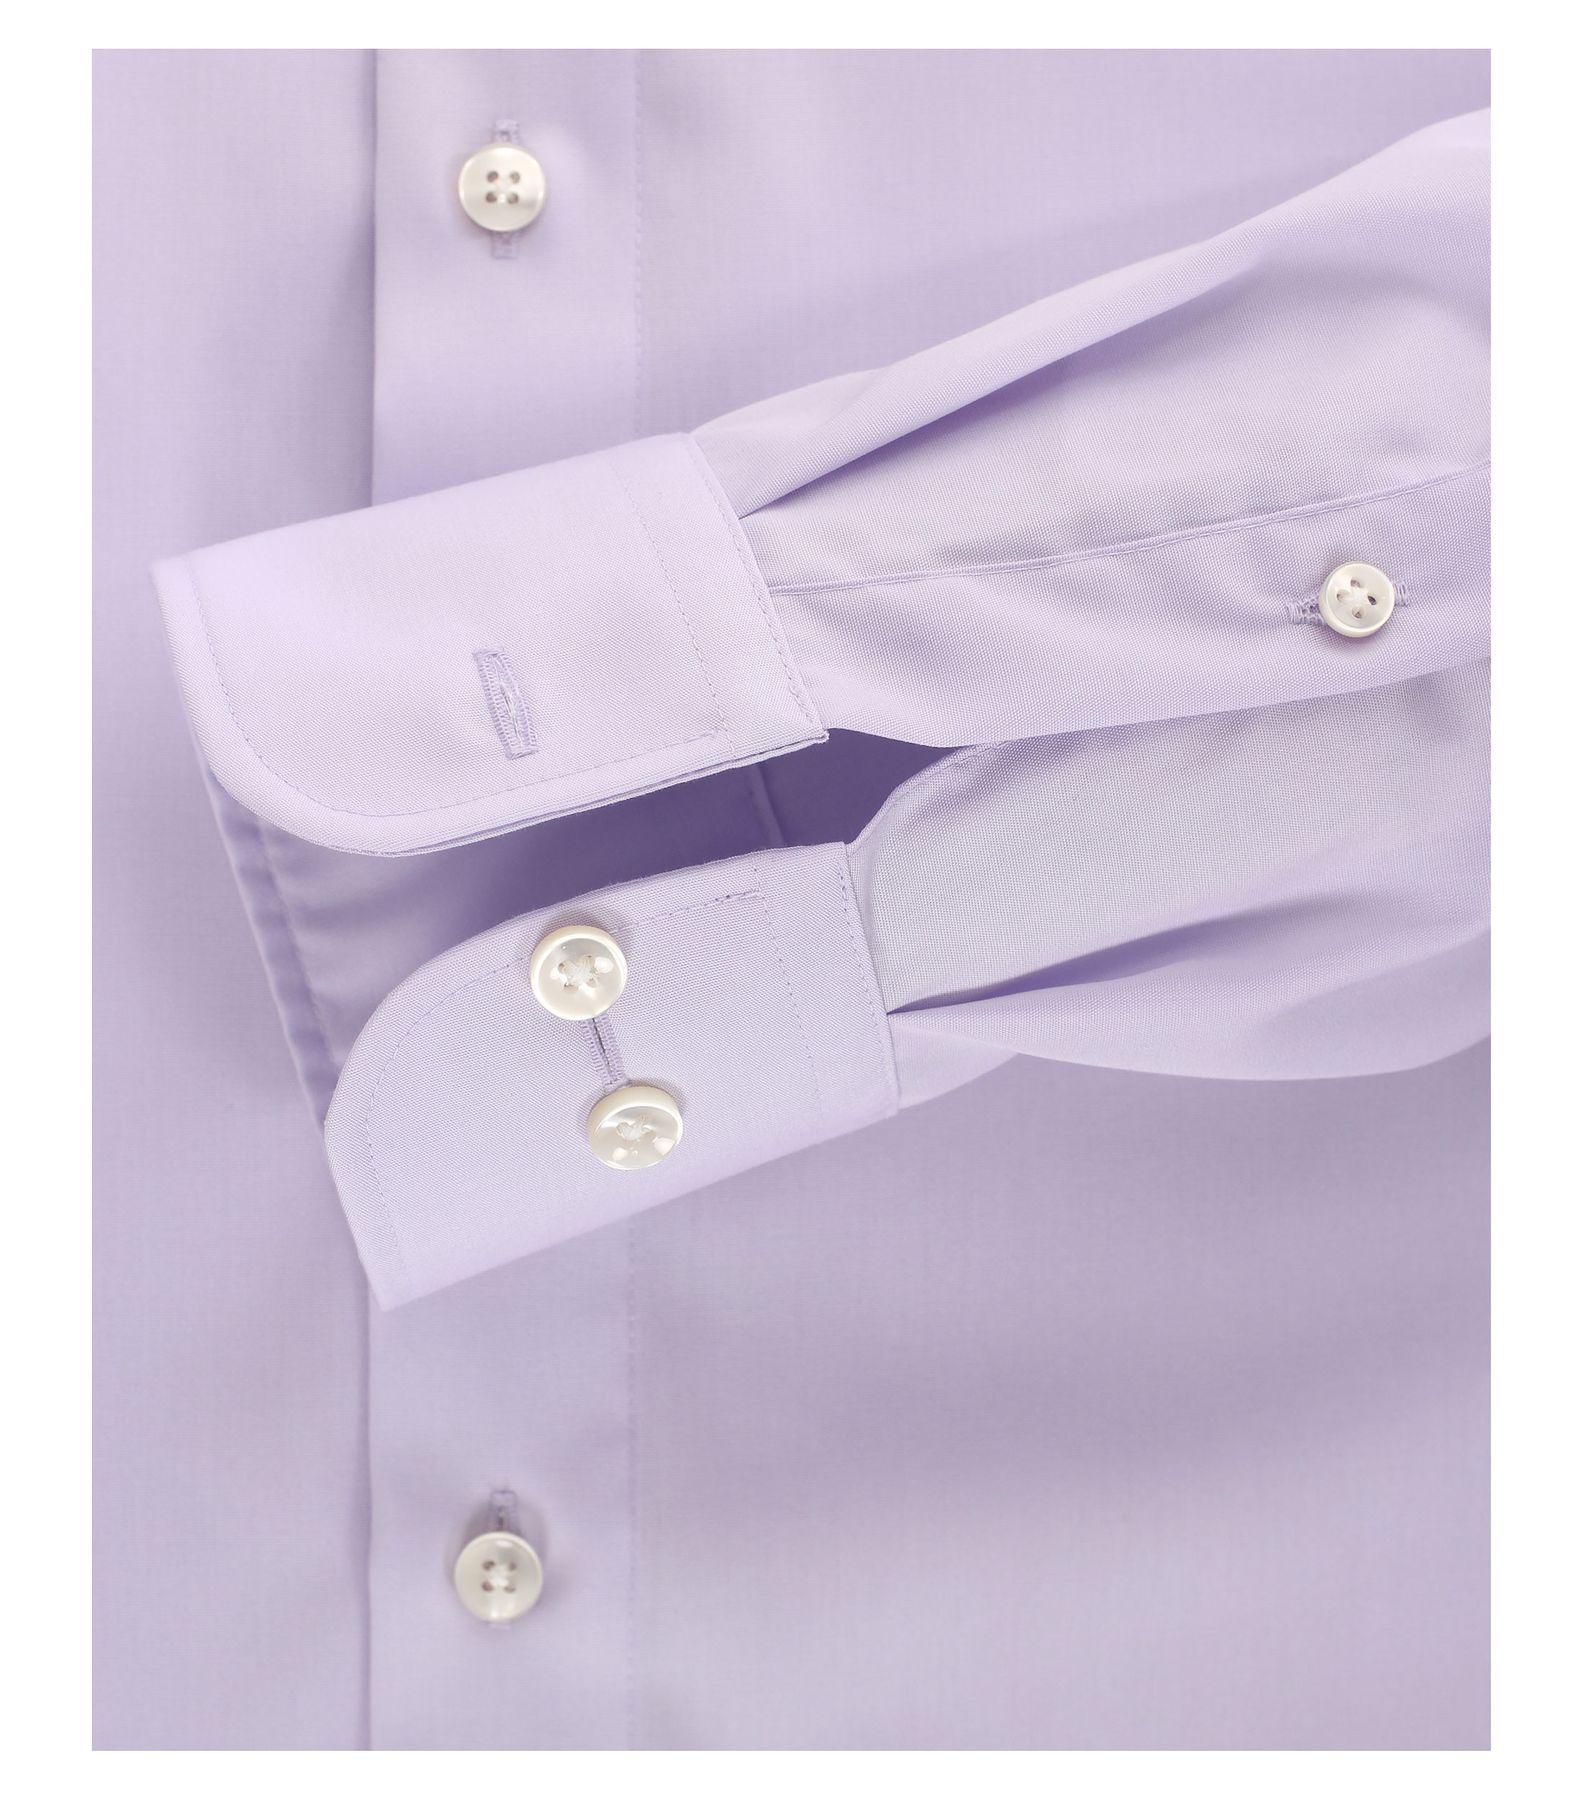 Casa Moda - Modern Fit - Bügelfreies Herren Business langarm Hemd in verschiedene Farben (006550) – Bild 4